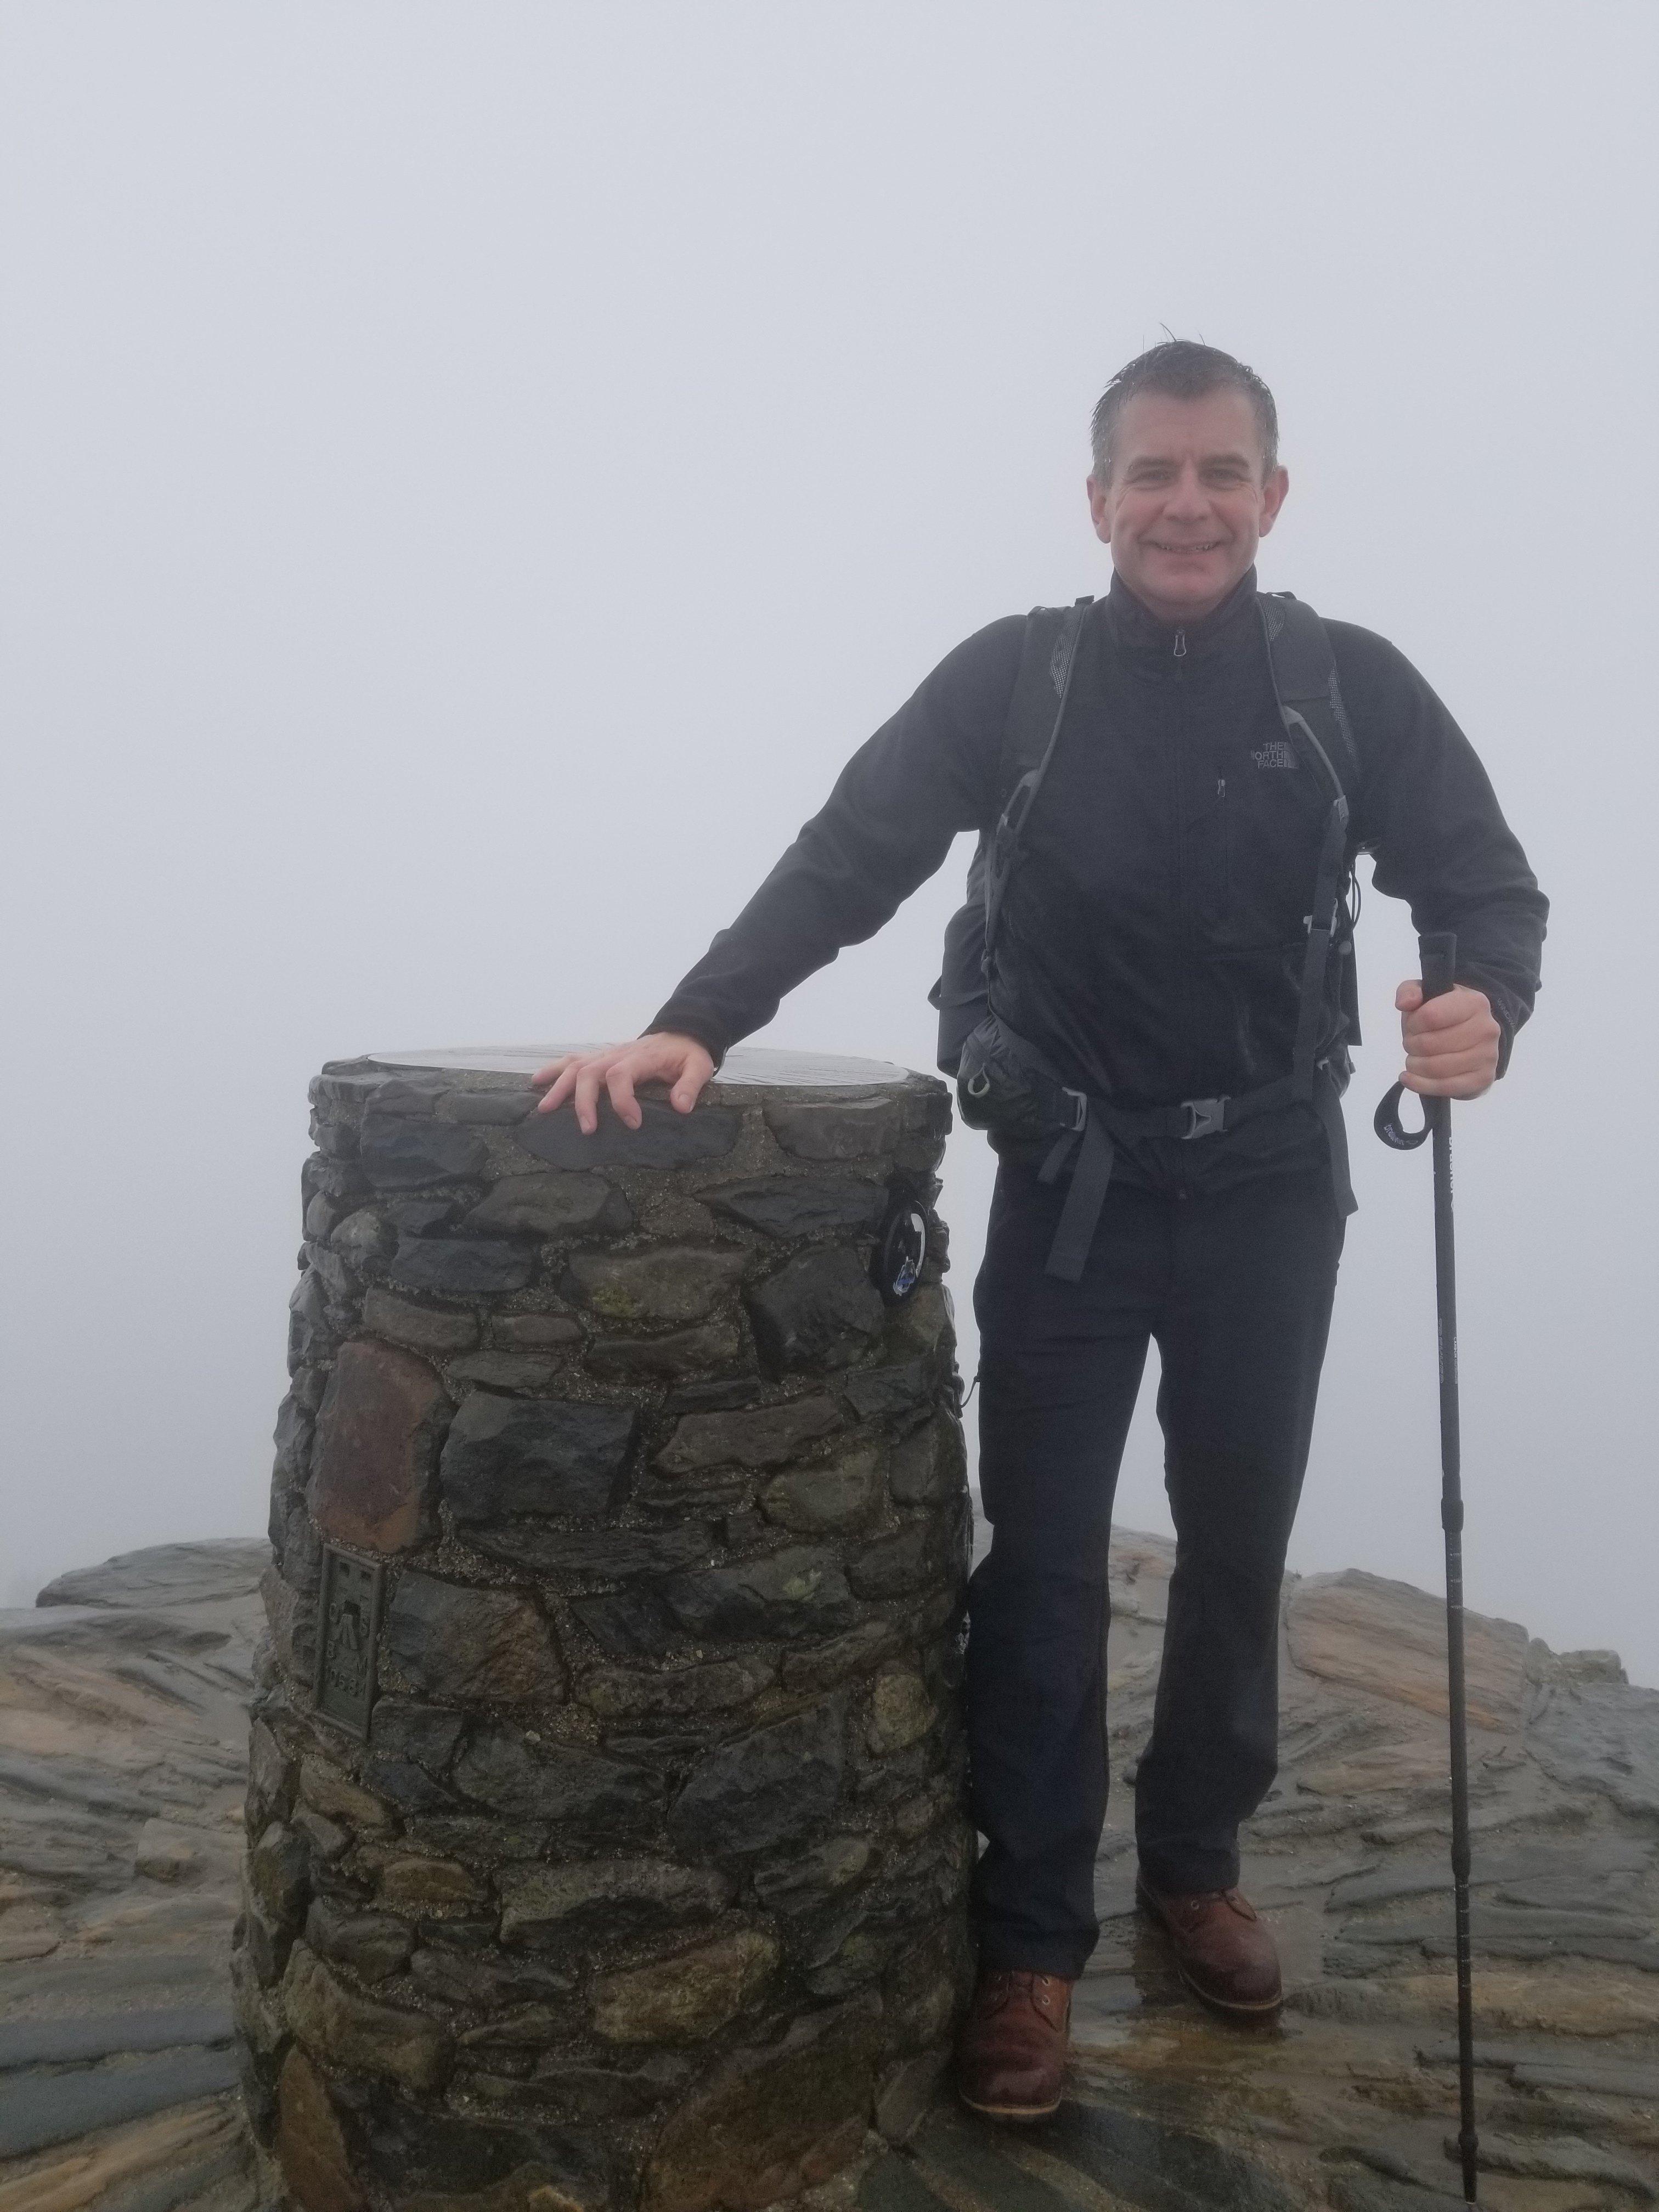 Nigel Yates on the summit of Mount Snowdon